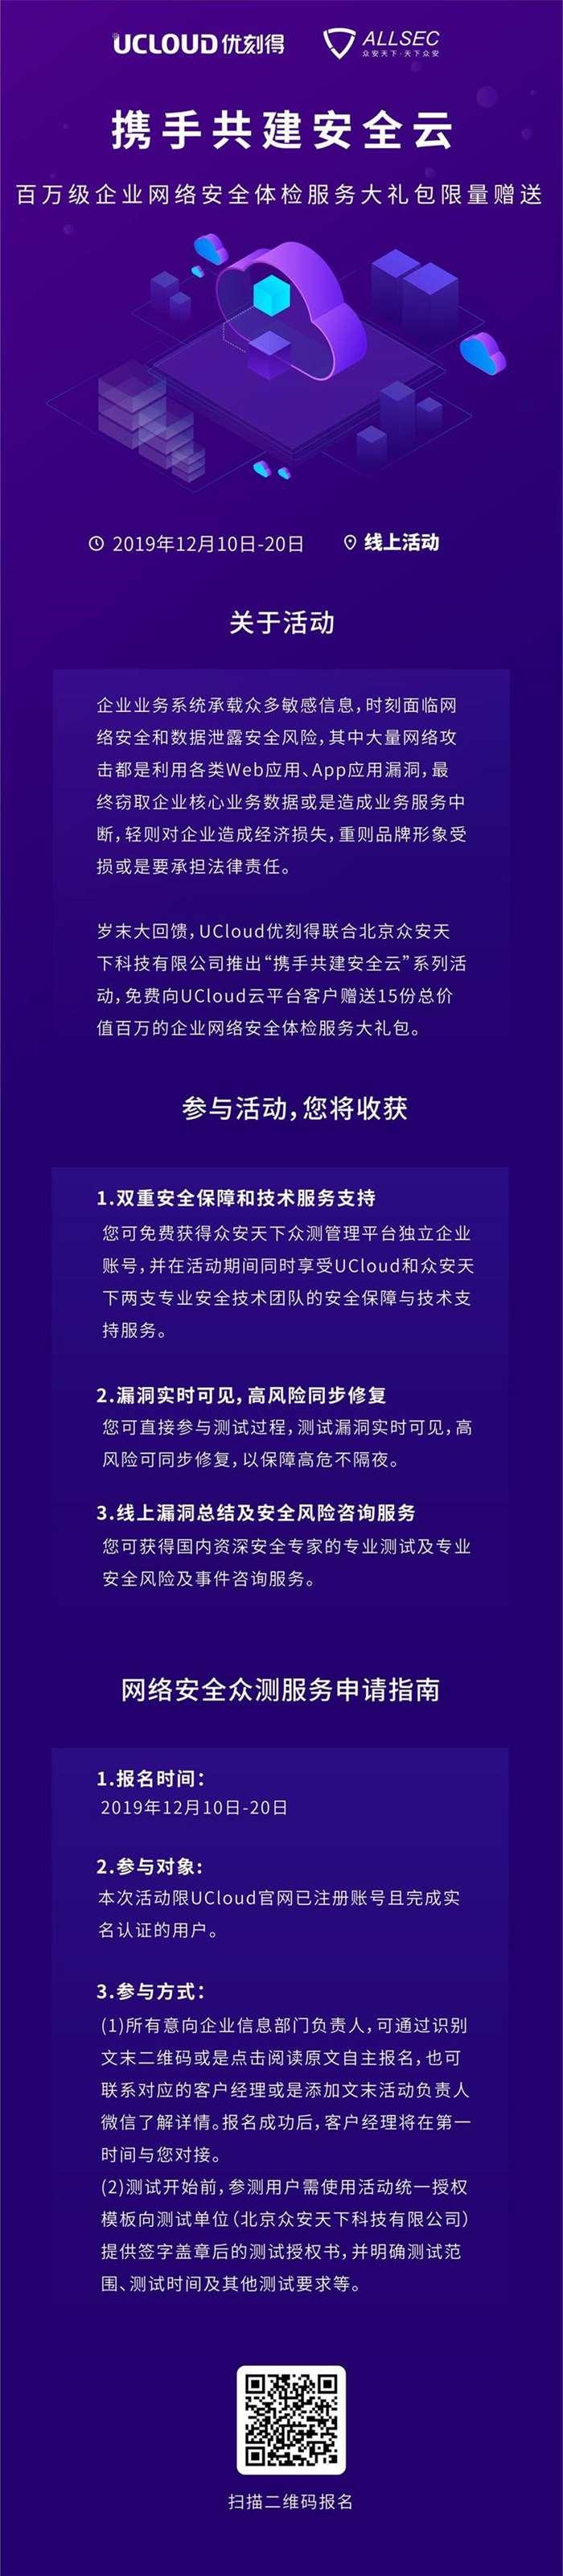 安全活动议程图-01-01.png